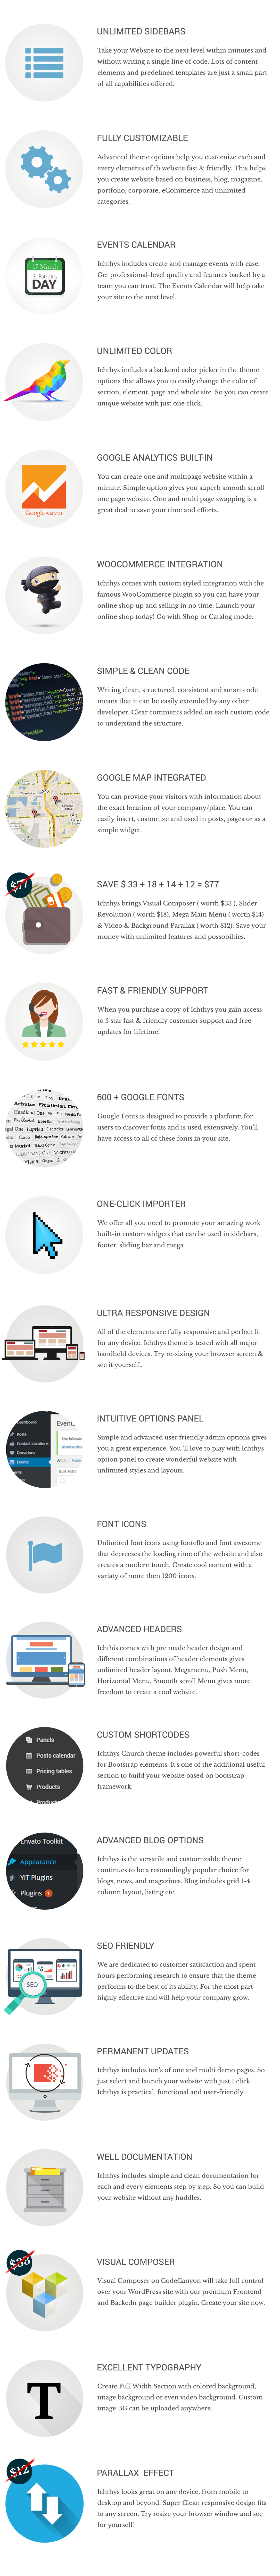 Ichthys - Church WordPress Theme - 7